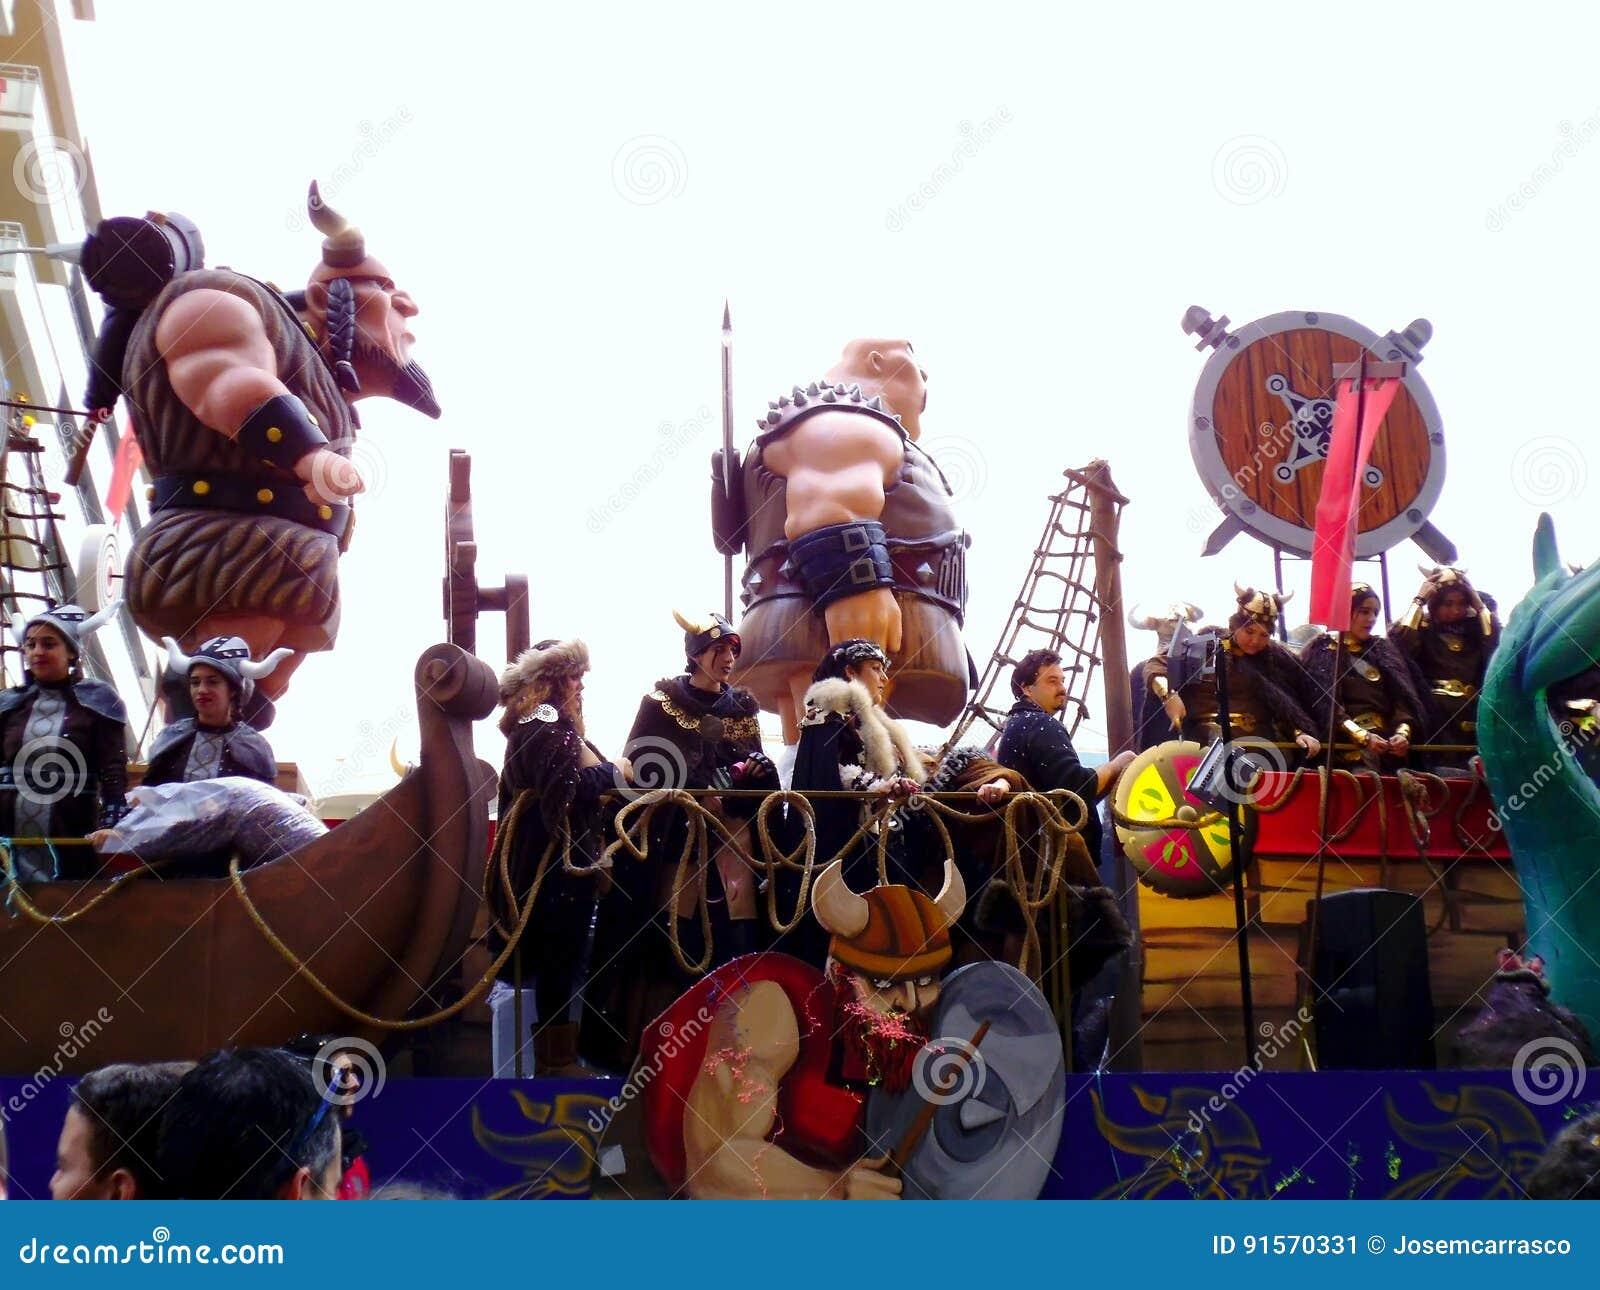 Carnaval de Cadiz 2017 andalusia spain